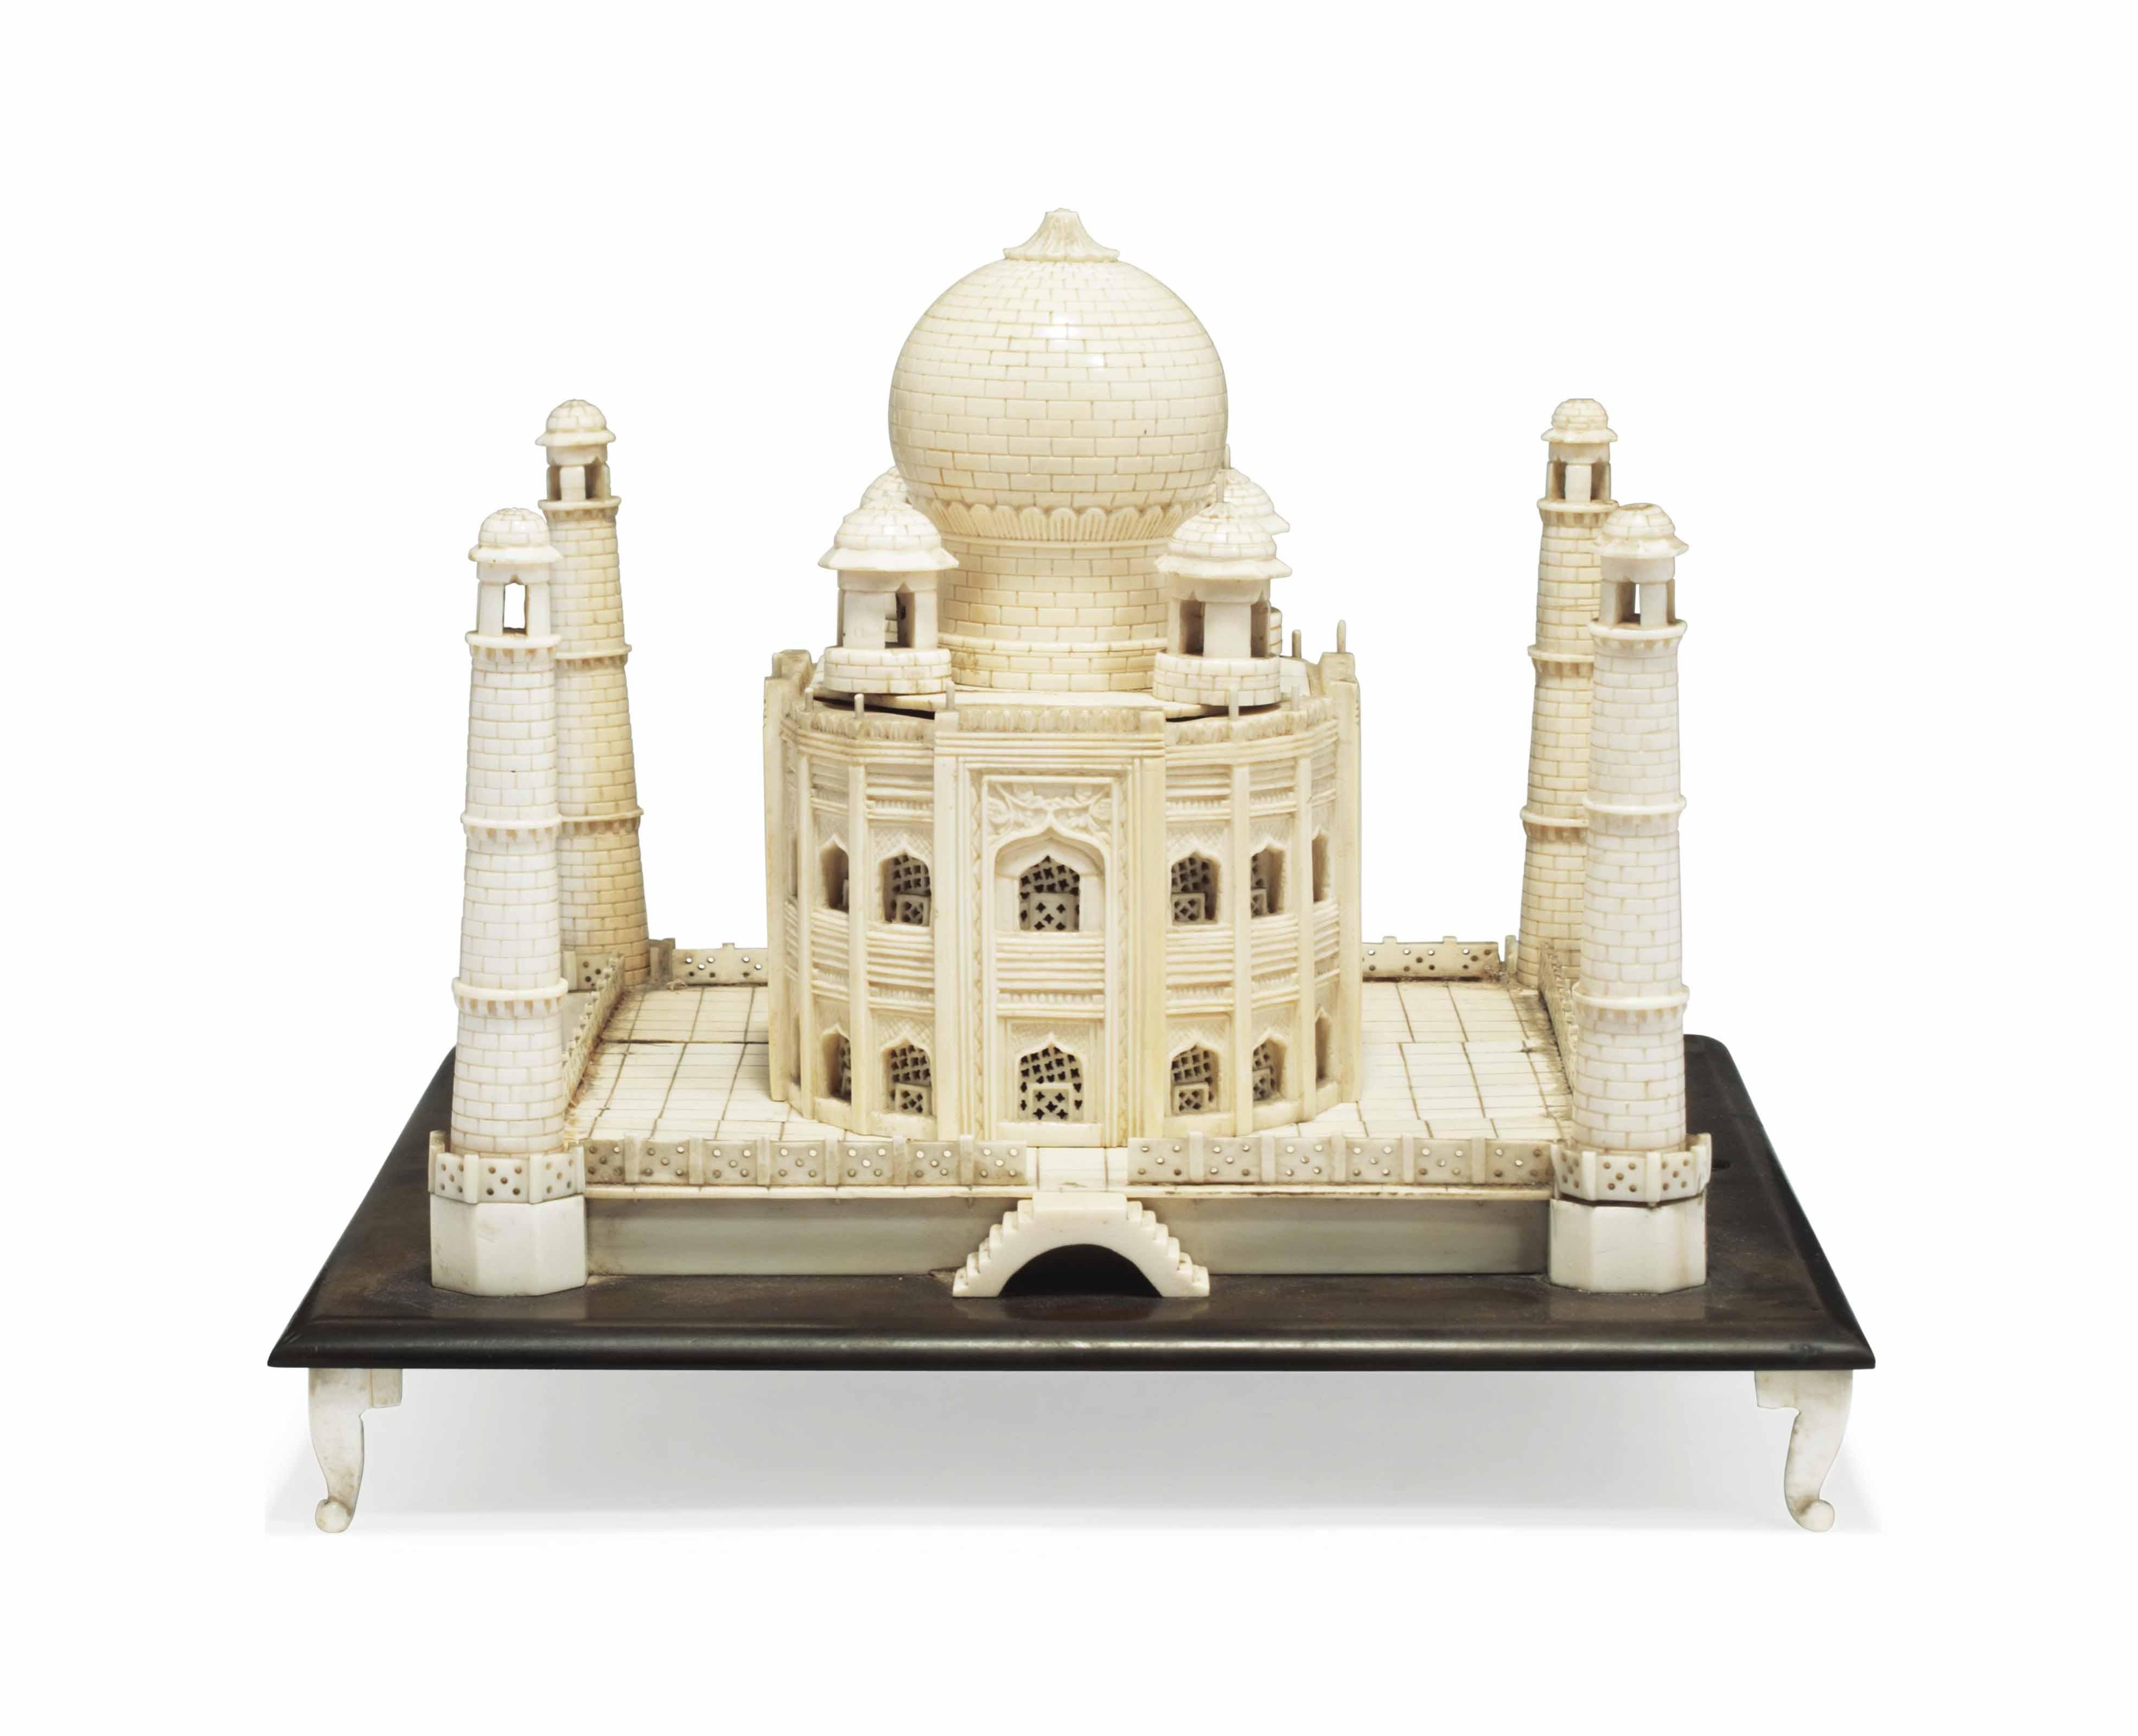 AN IVORY MODEL OF THE TAJ MAHAL